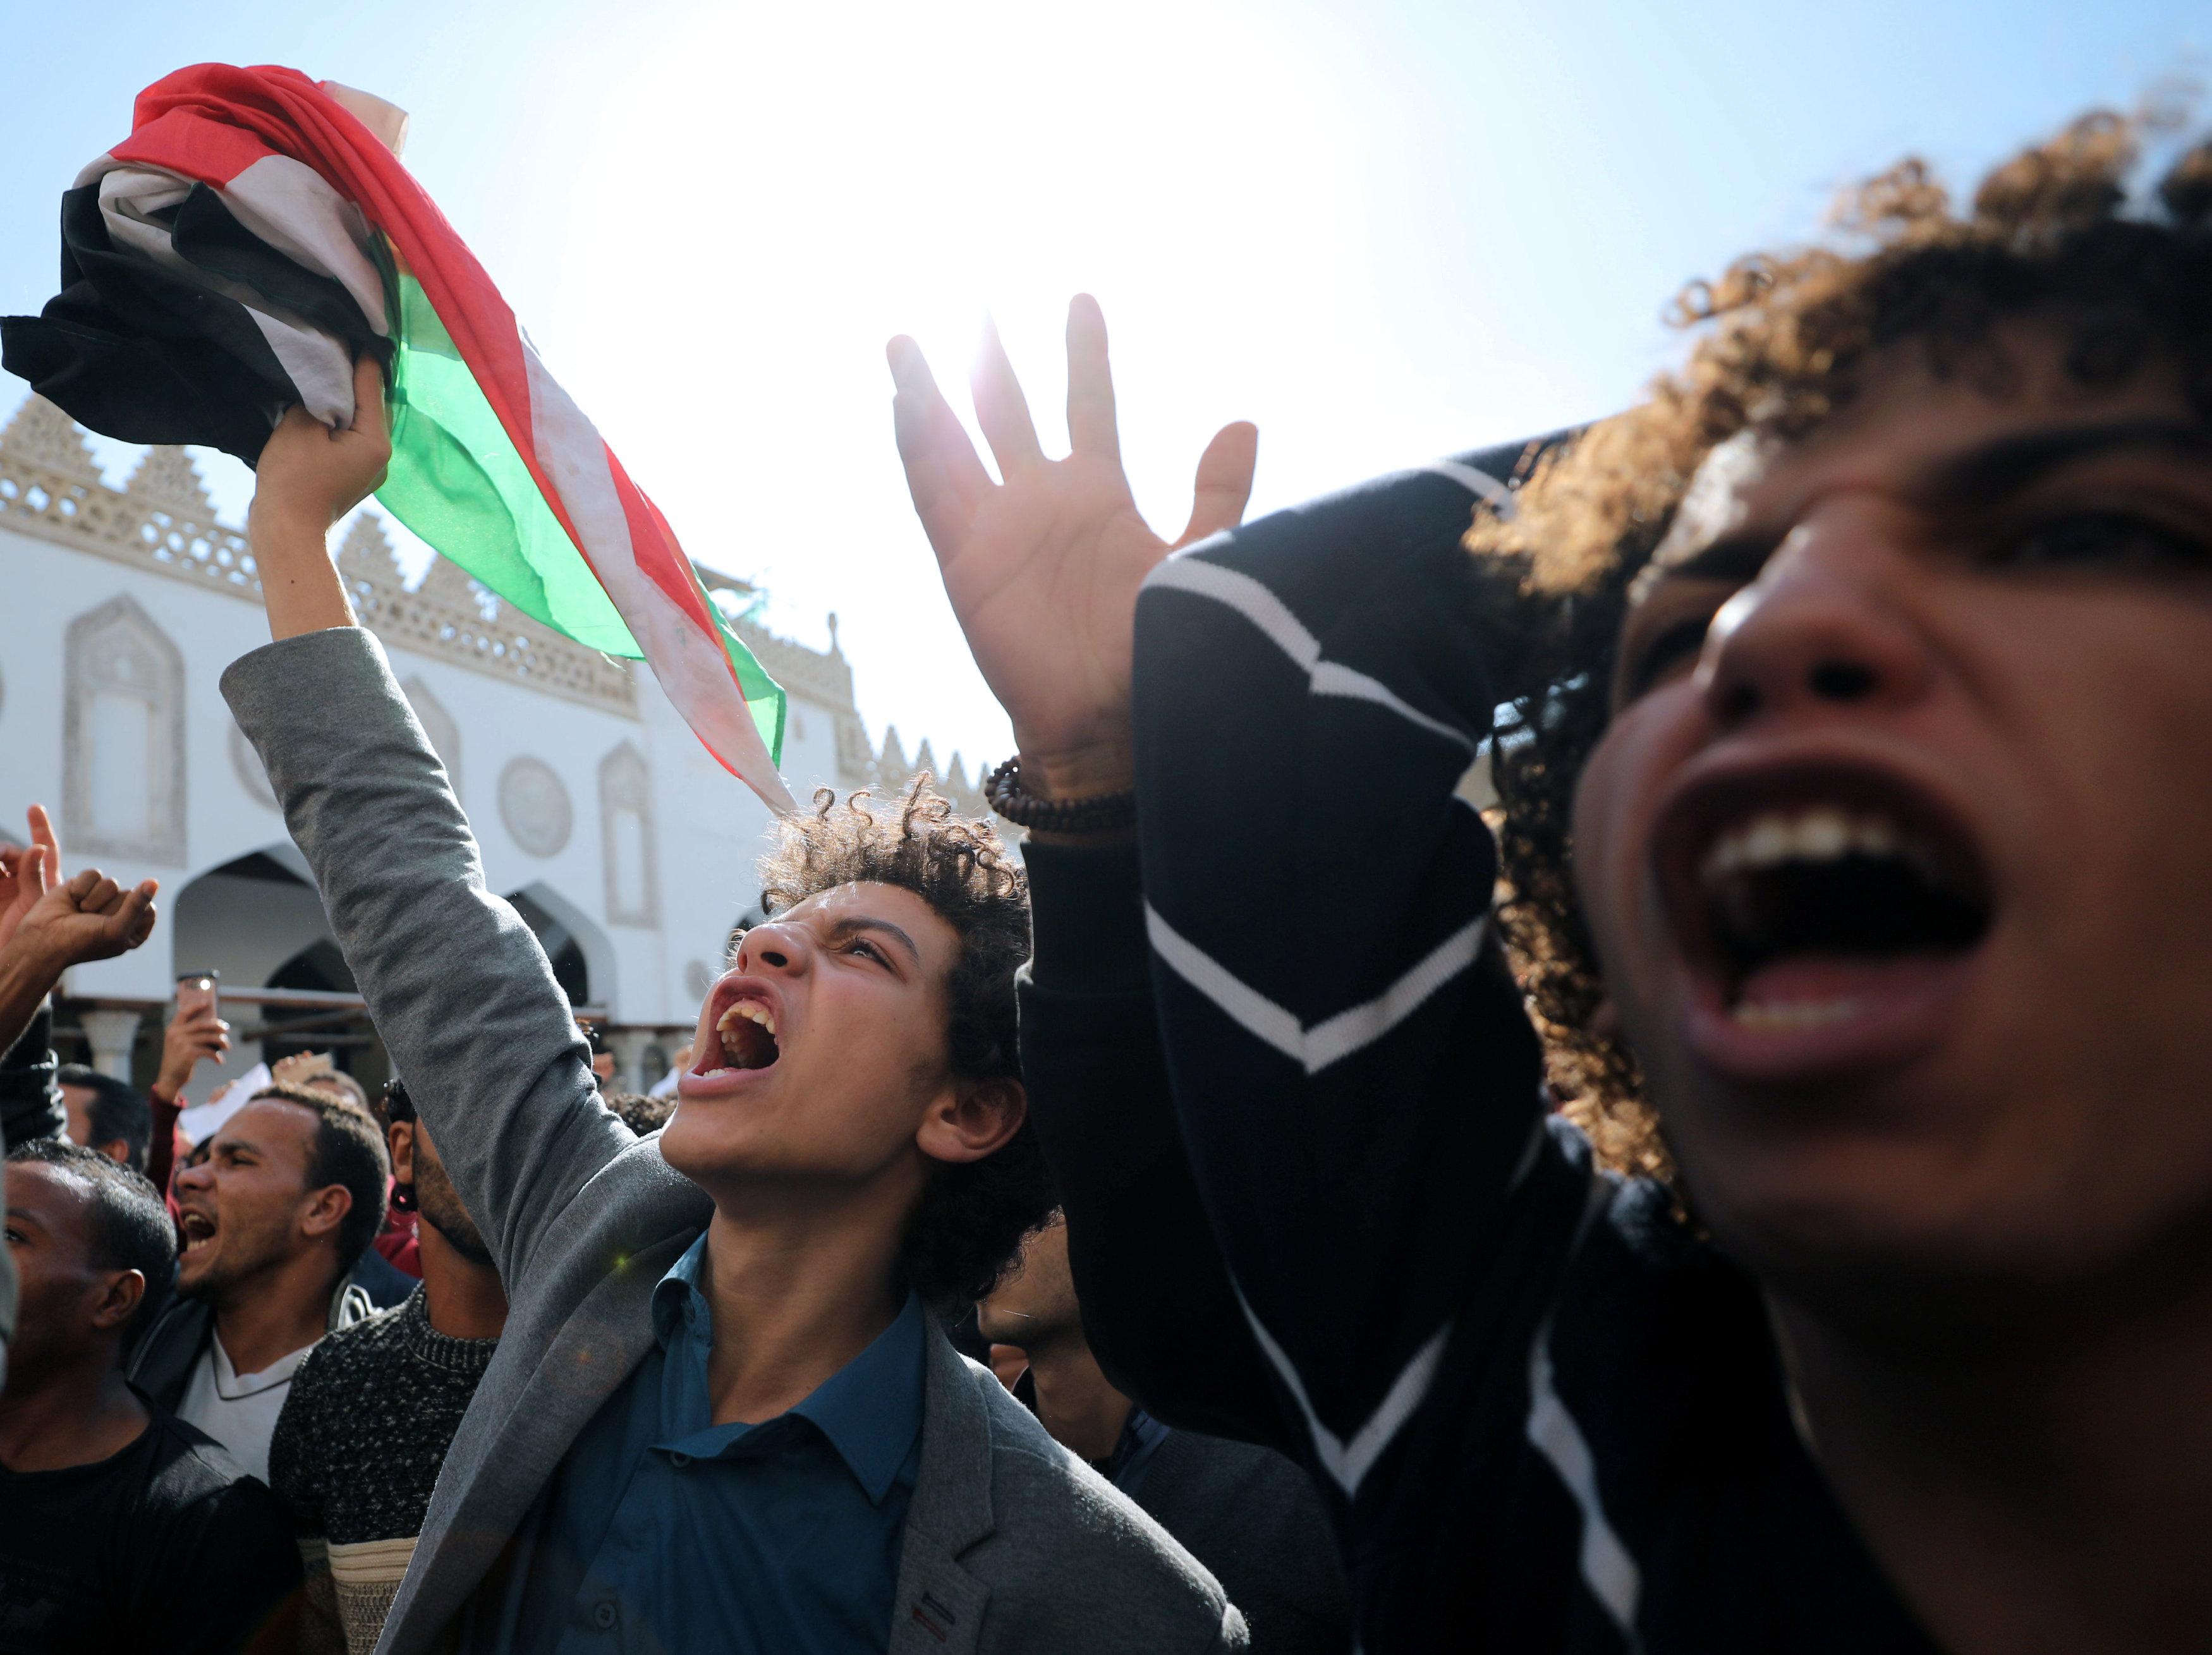 Two dead in 'Day of Rage' over Jerusalem, Palestinian president defiant